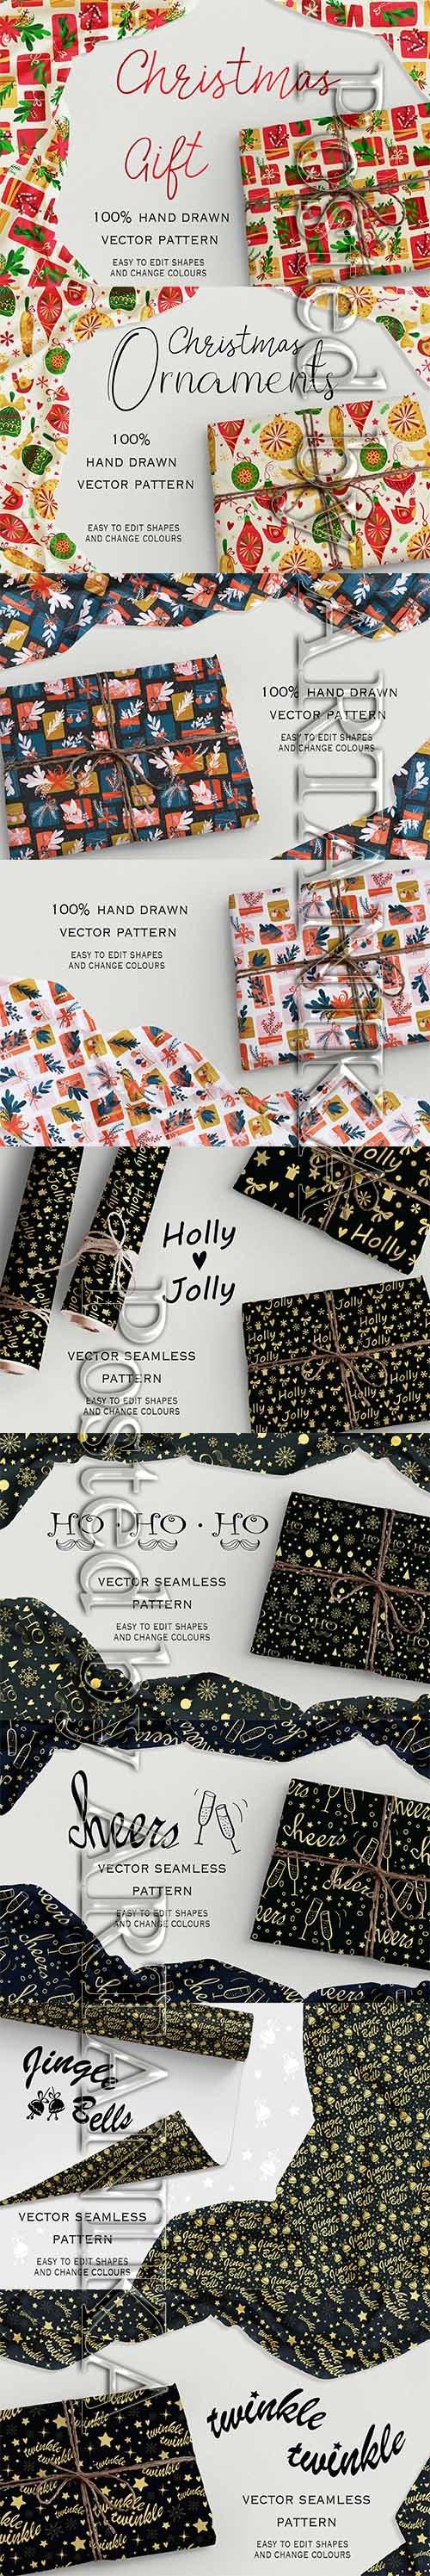 Christmas Seamless Gift Pattern Pack 2019